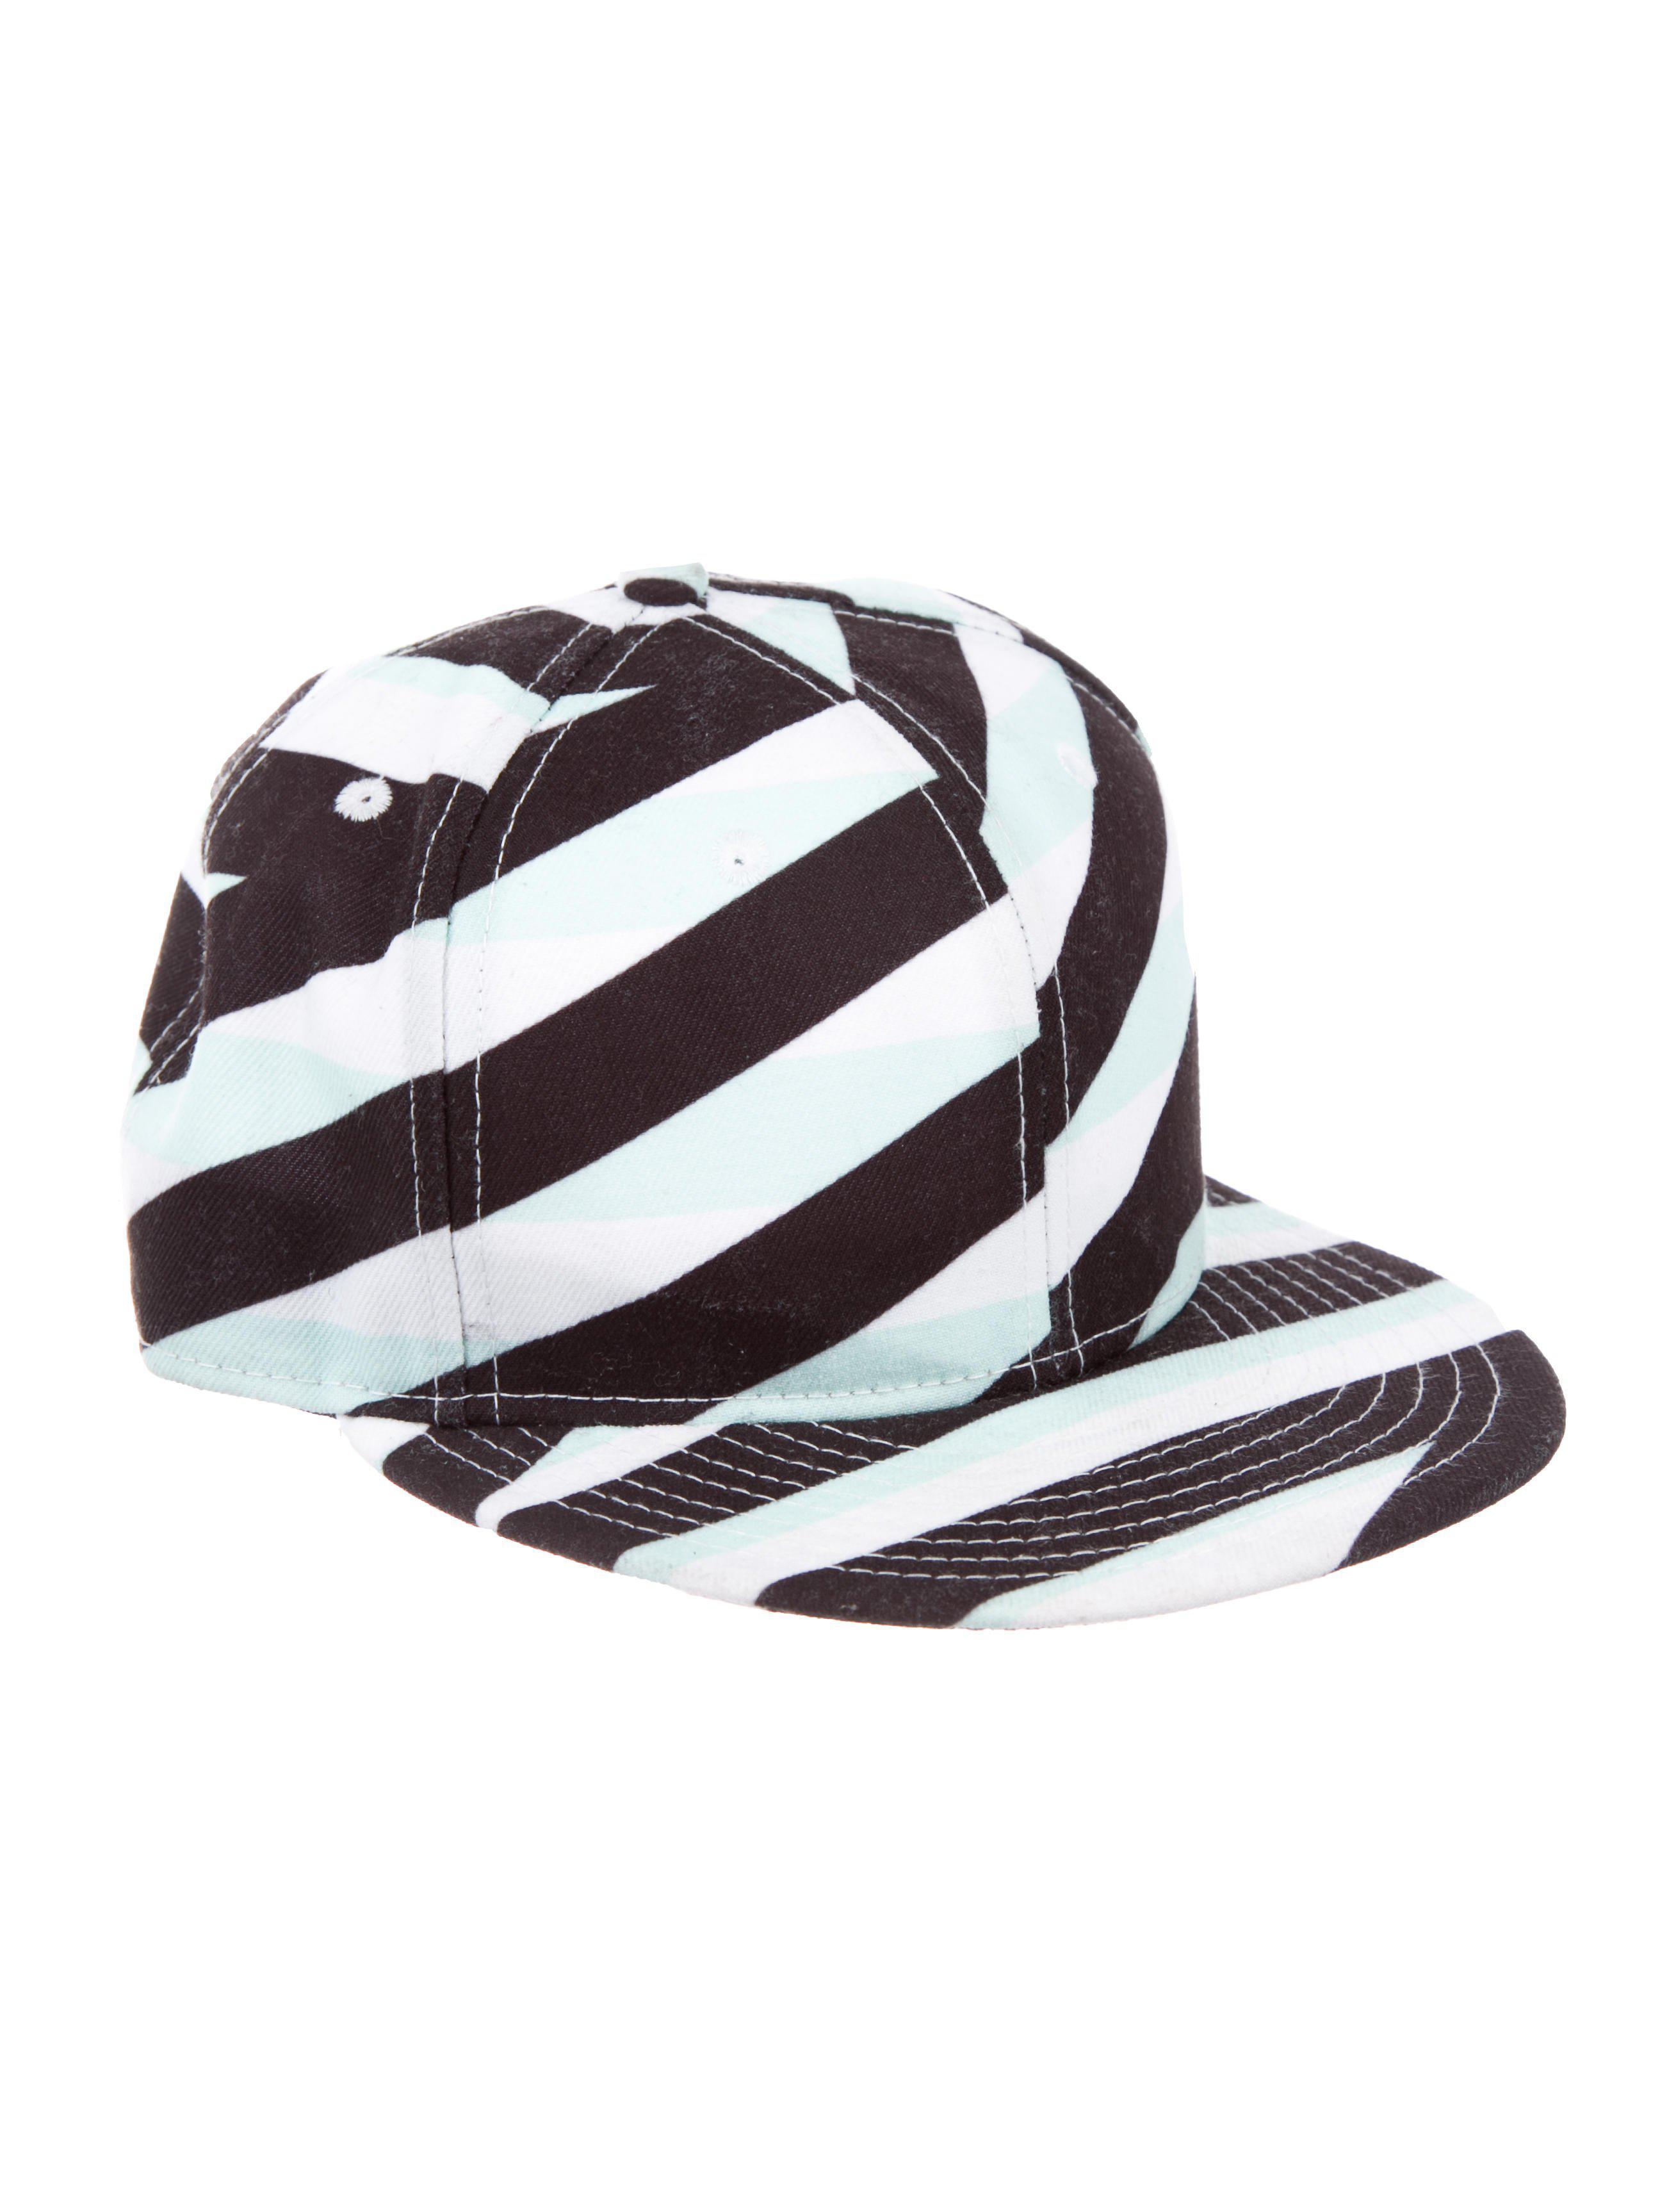 039411a843e51 Lyst - Kenzo For New Era Printed Baseball Cap in Black for Men